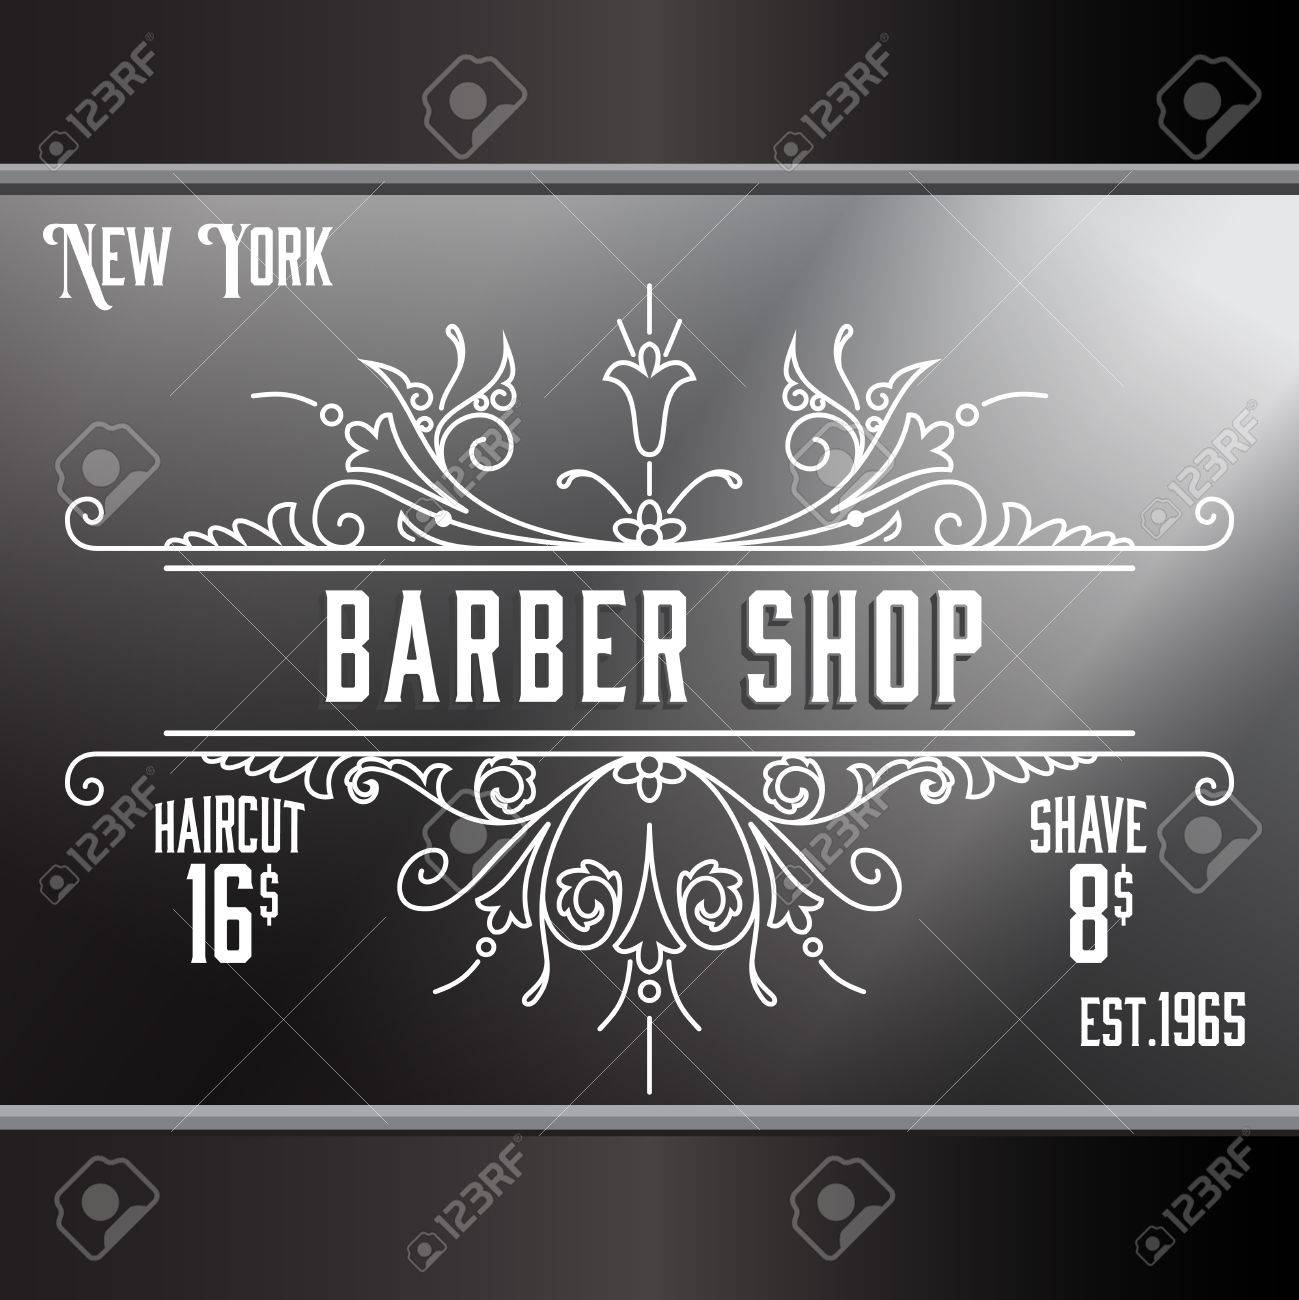 Old barber shop window - Vintage Barber Shop Window Advertising Design Template Elegant Line Art And Flourishes Ornament For Hair